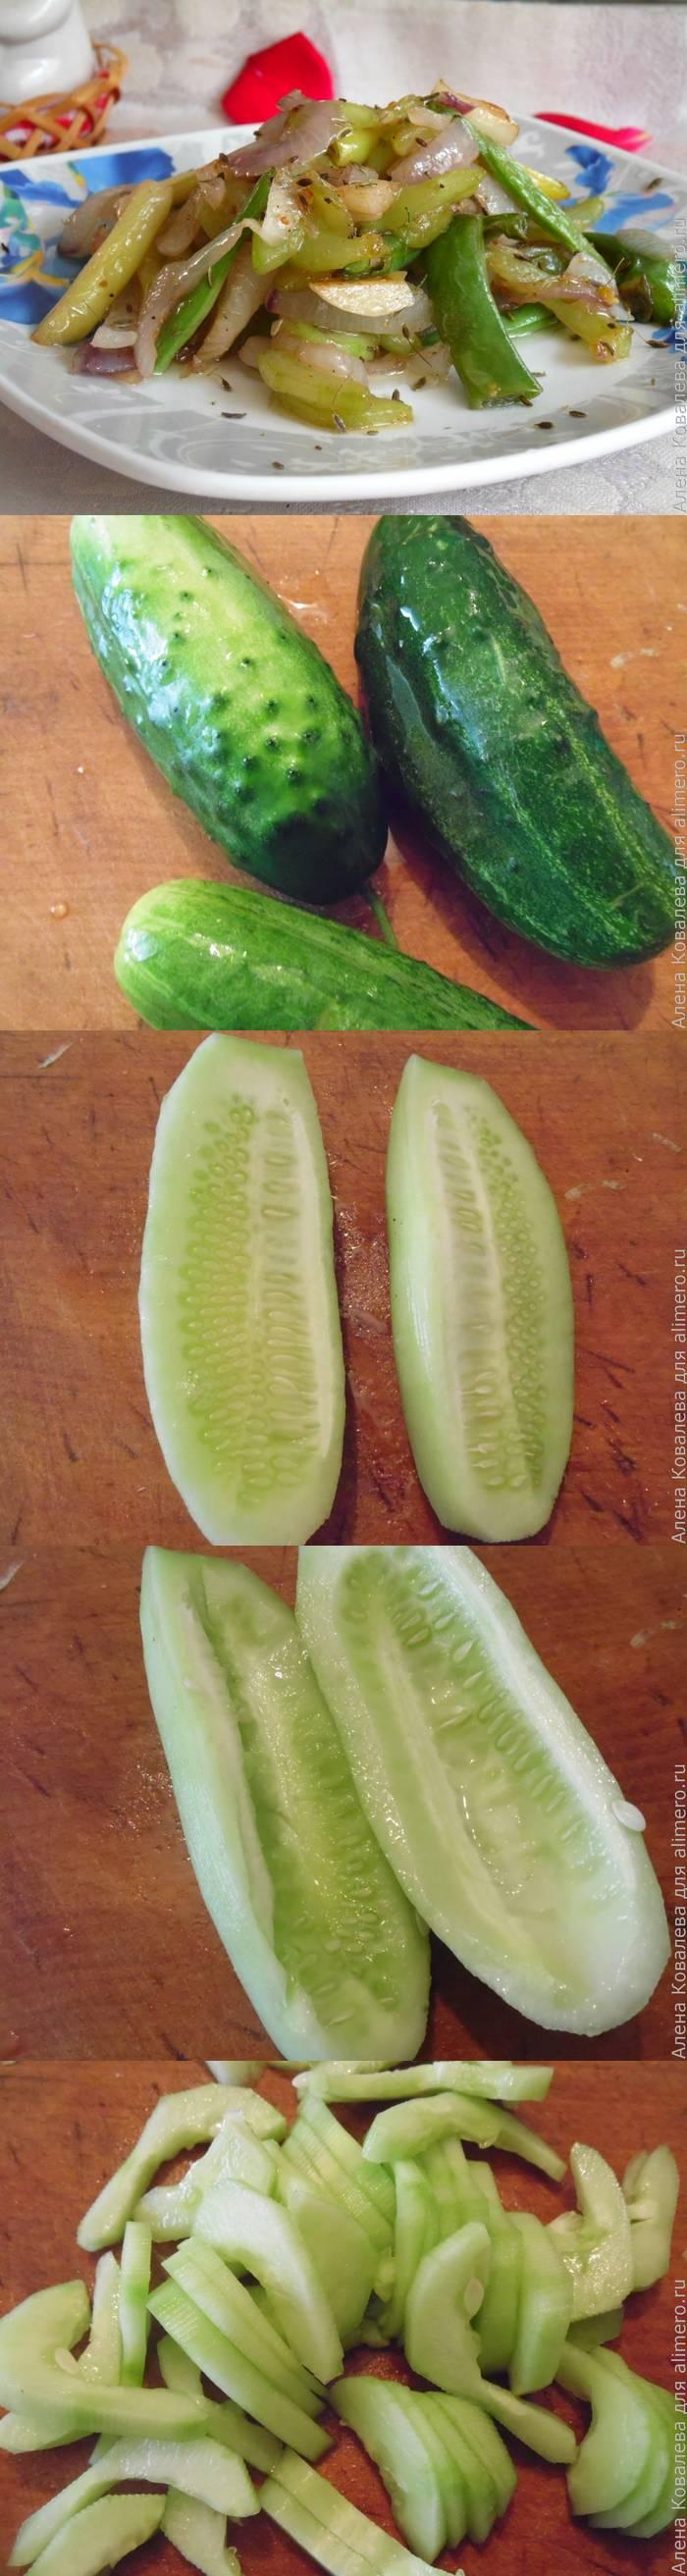 Теплый салат из жареных огурцов